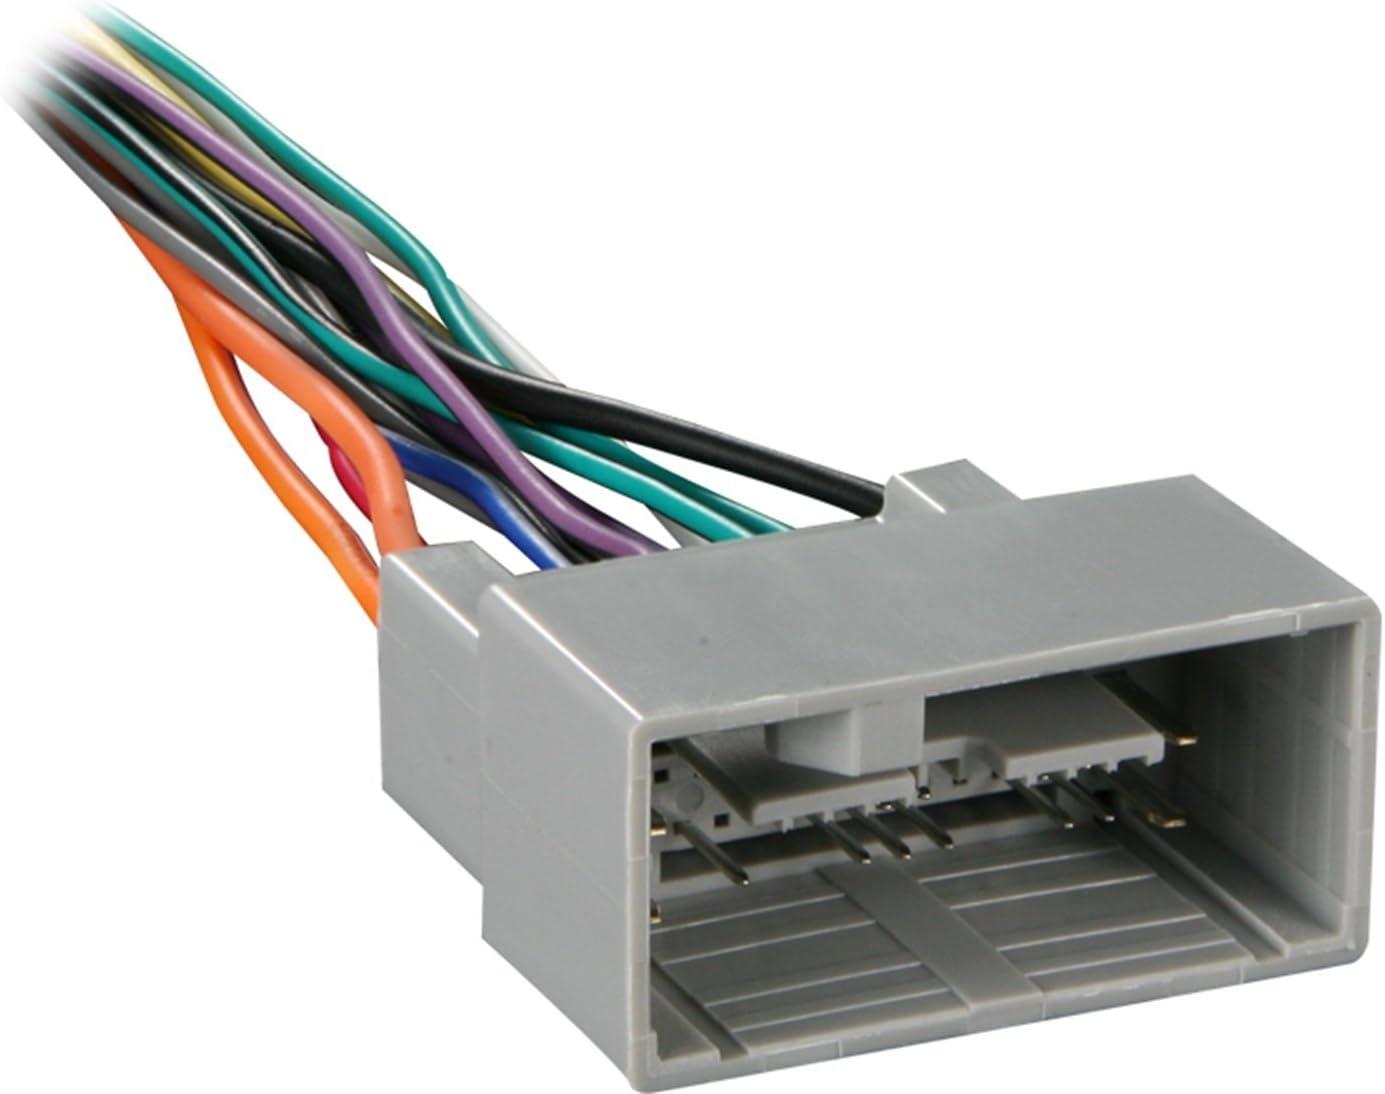 1998 honda cr v radio wiring diagram amazon com metra 70 1729 radio wiring harness for honda 2008 up  metra 70 1729 radio wiring harness